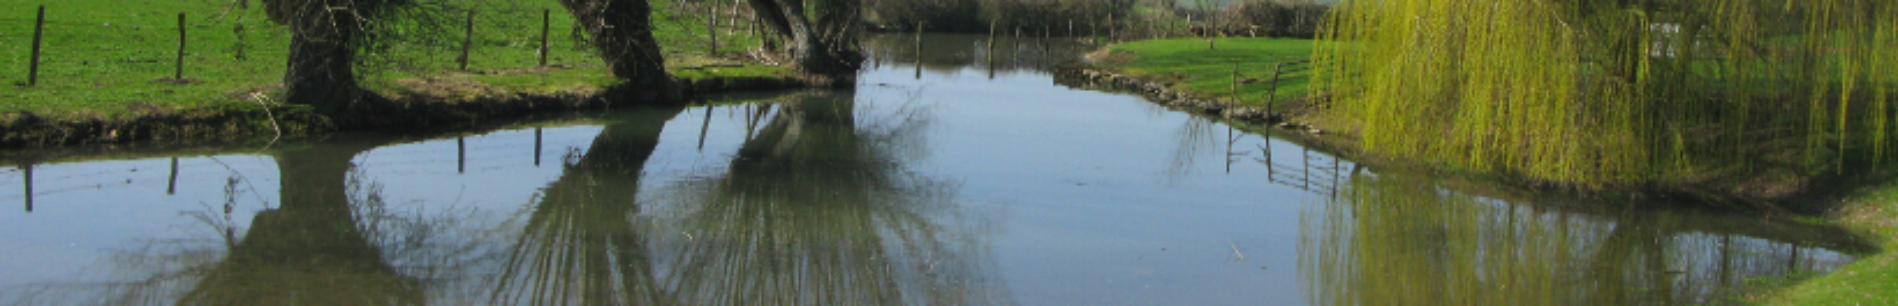 Bandeau Bassin Versant @BVN